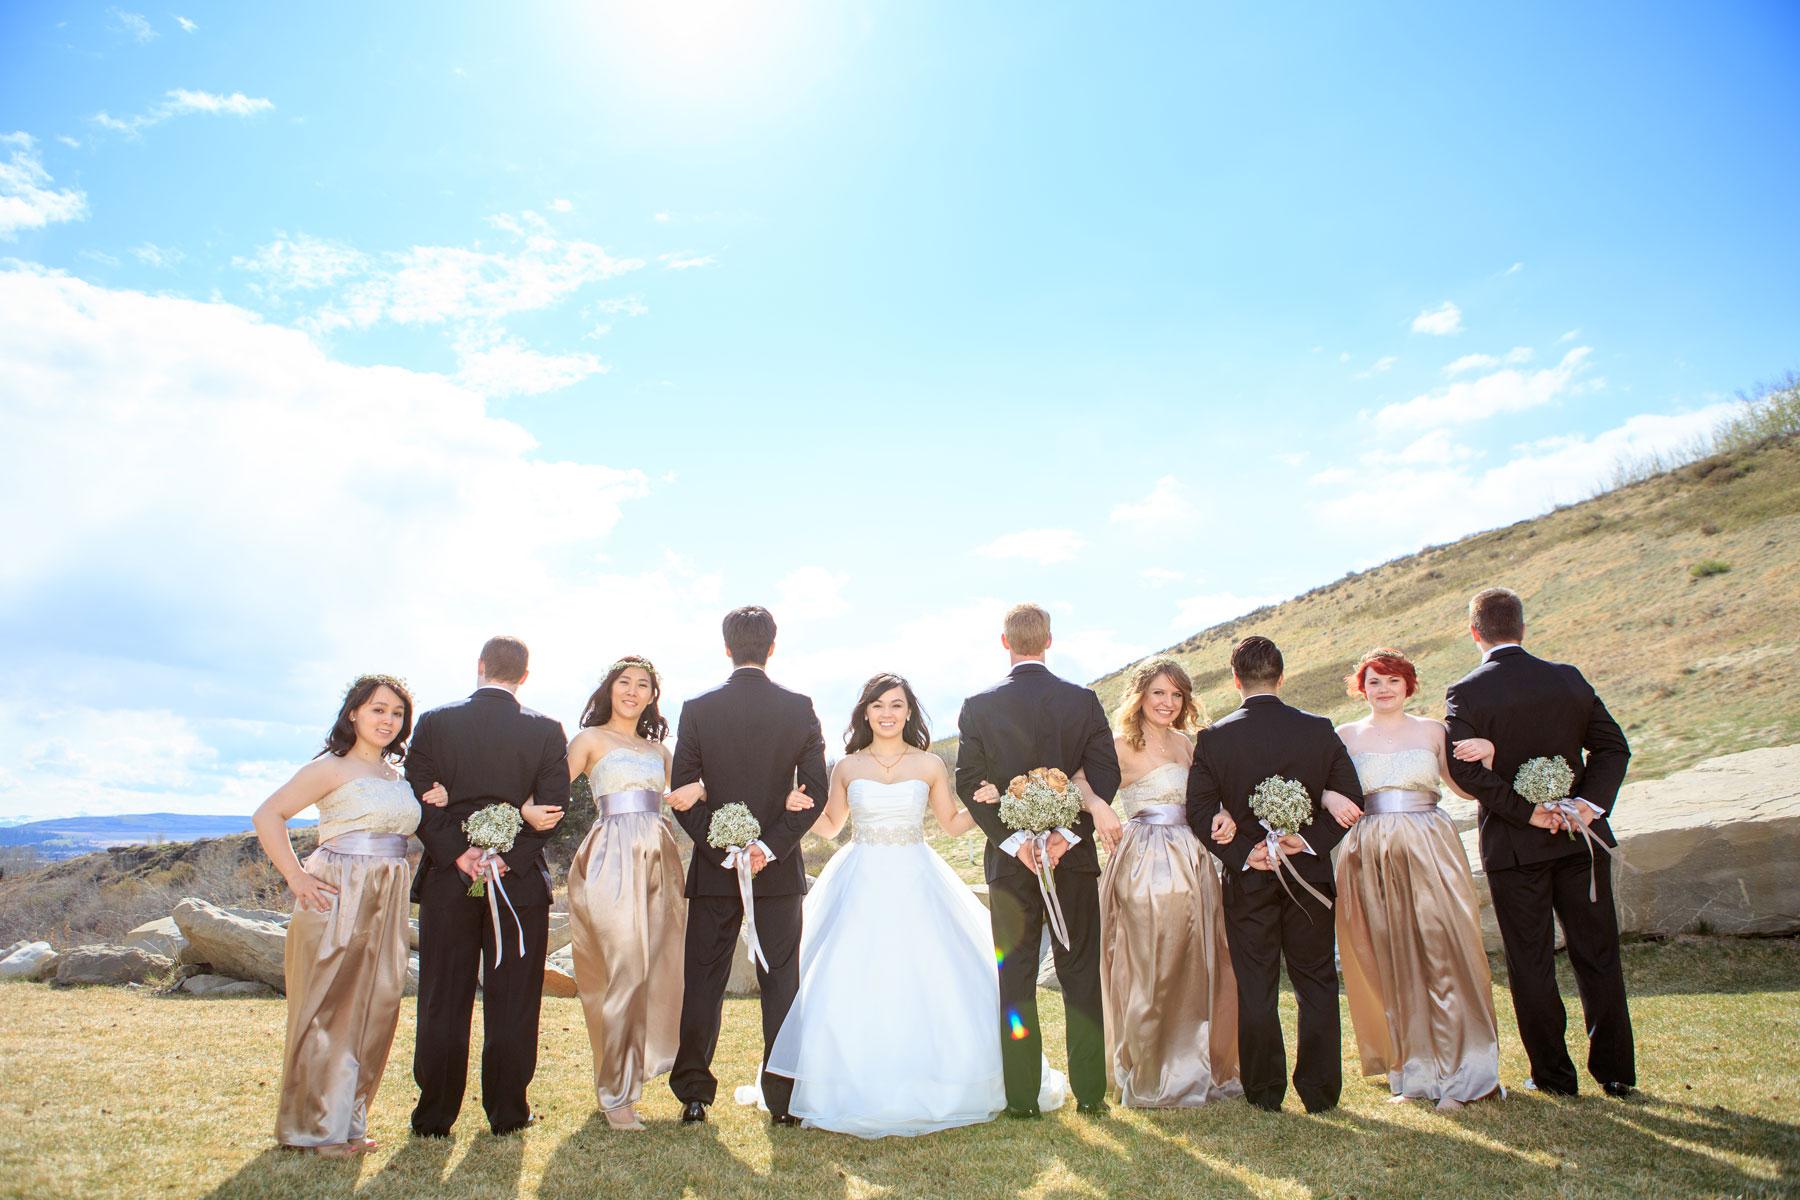 Tina-&-Jordan-Calgary-Wedding-Cochrane-Wedding-Cochrane-Ranchehouse-Olson-Studios-(21)